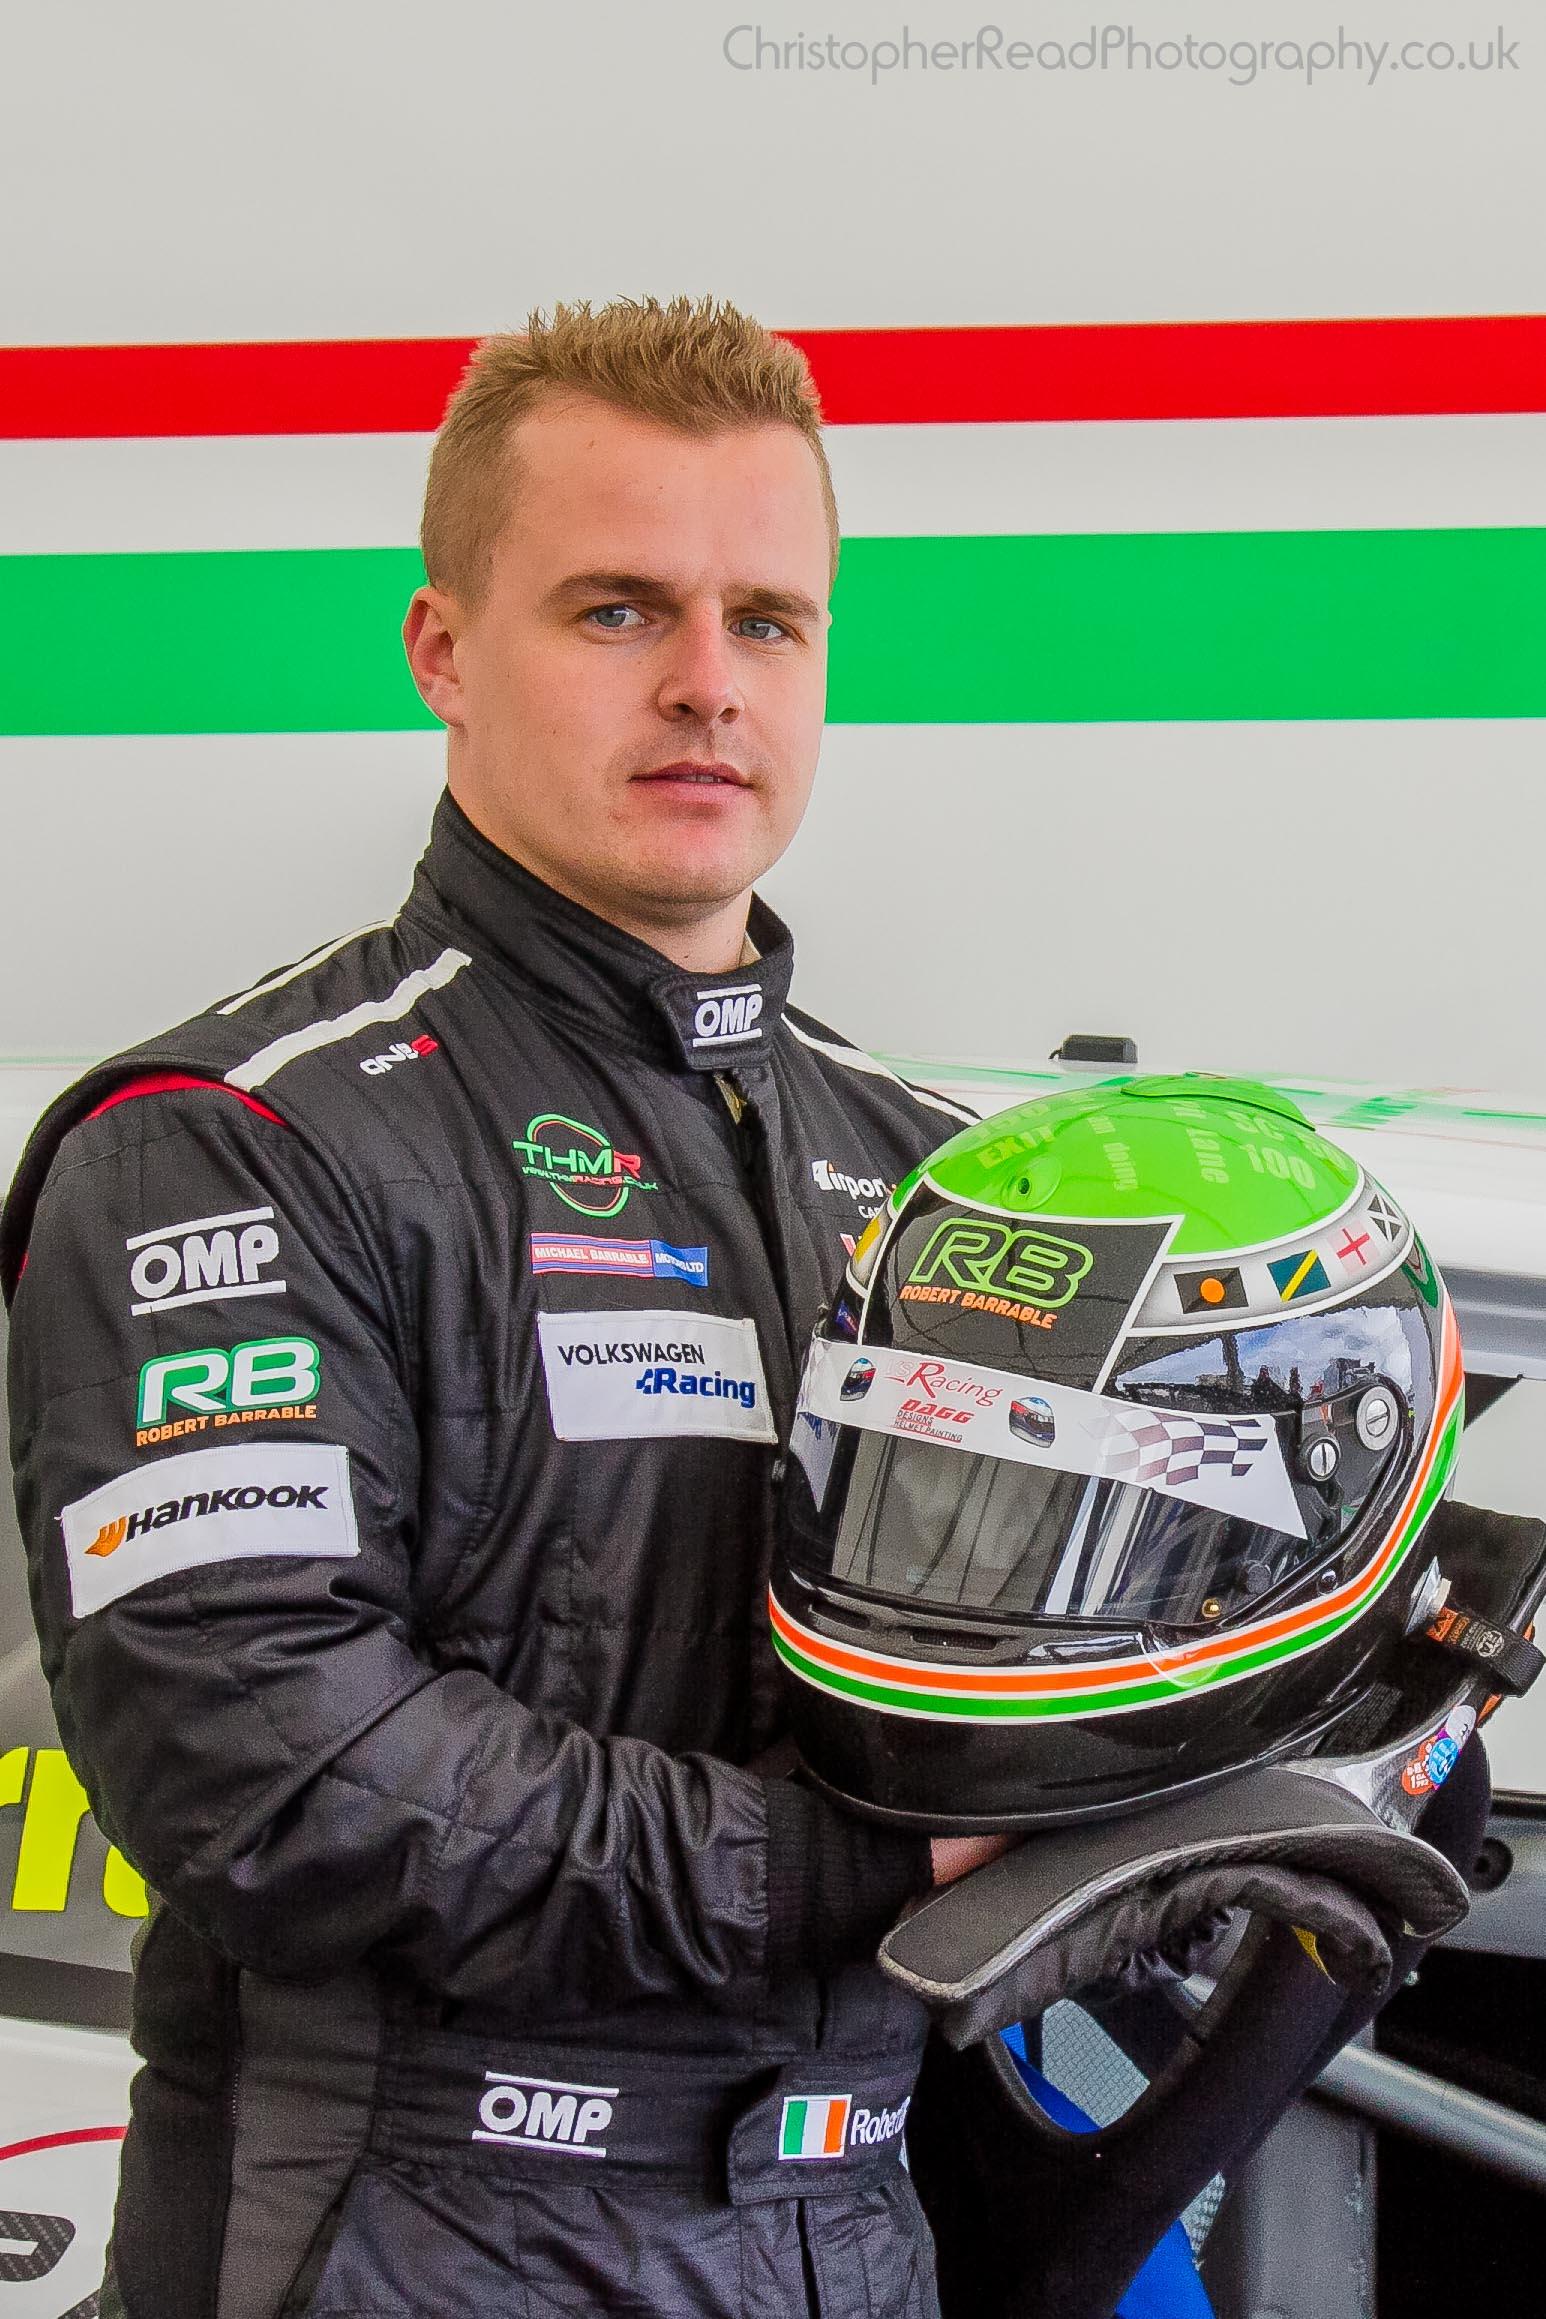 THM Racing - Robert Barrable